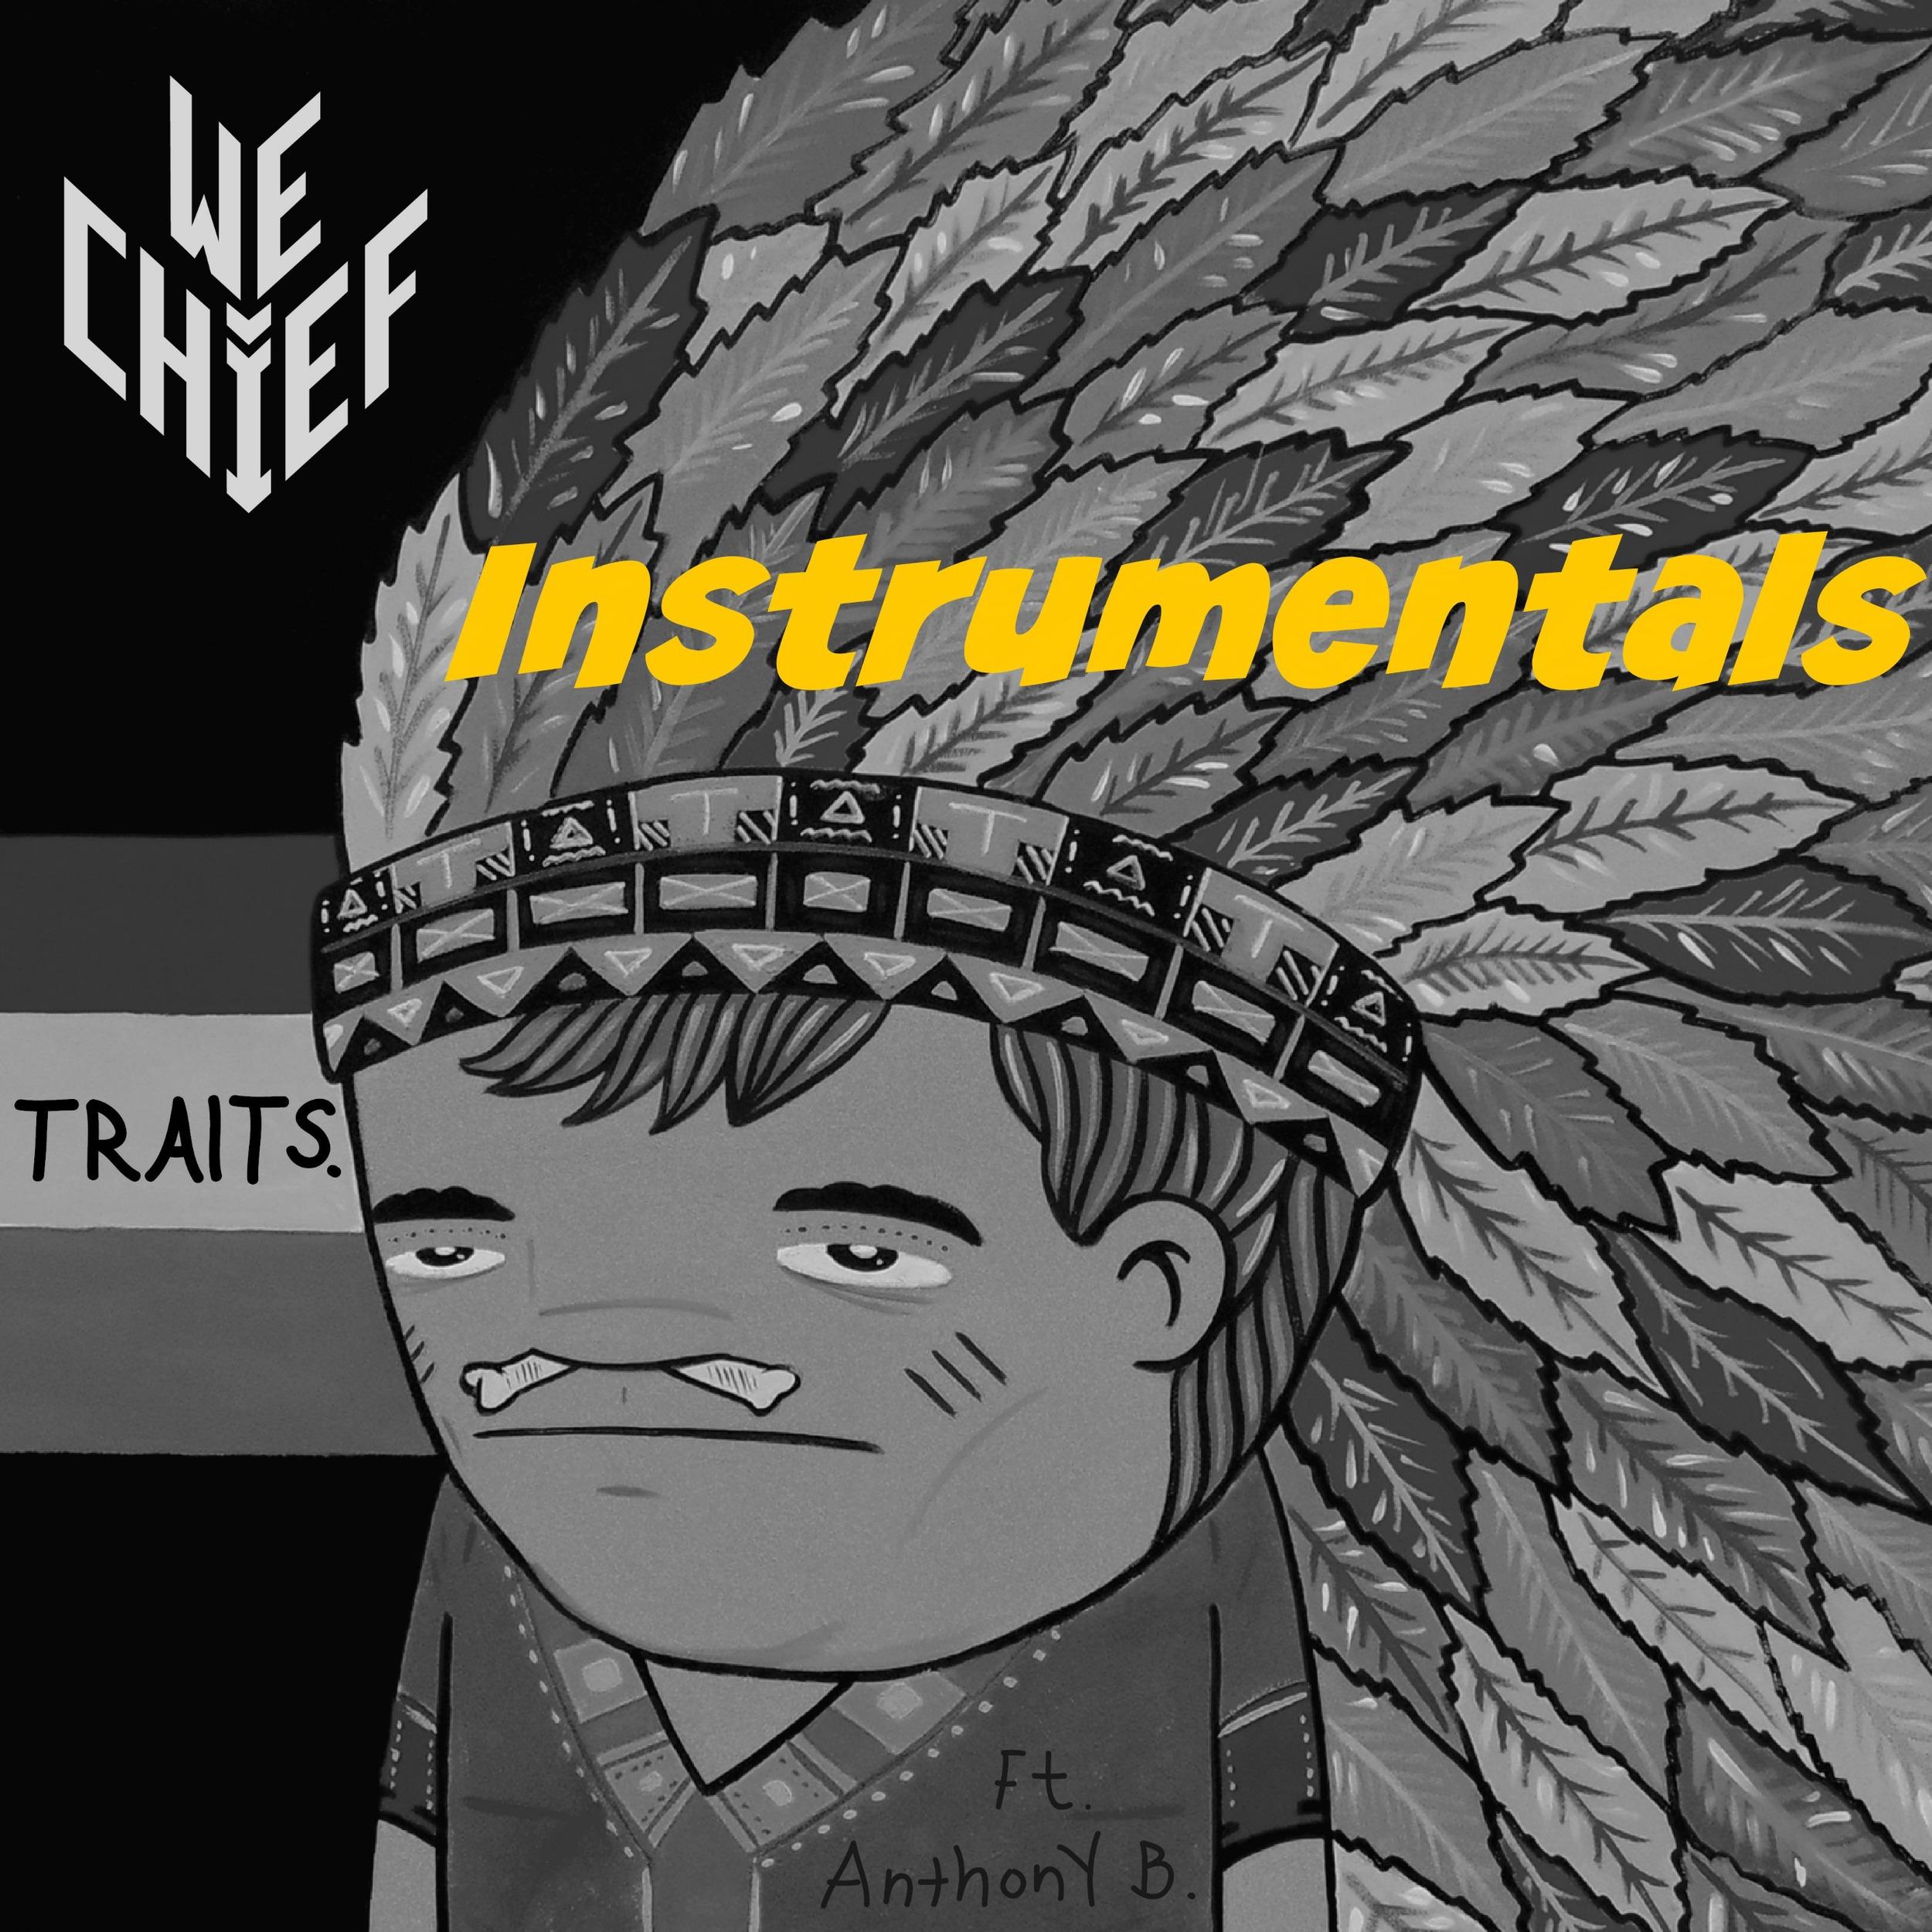 WC_Traits Instrumentals Art.jpg